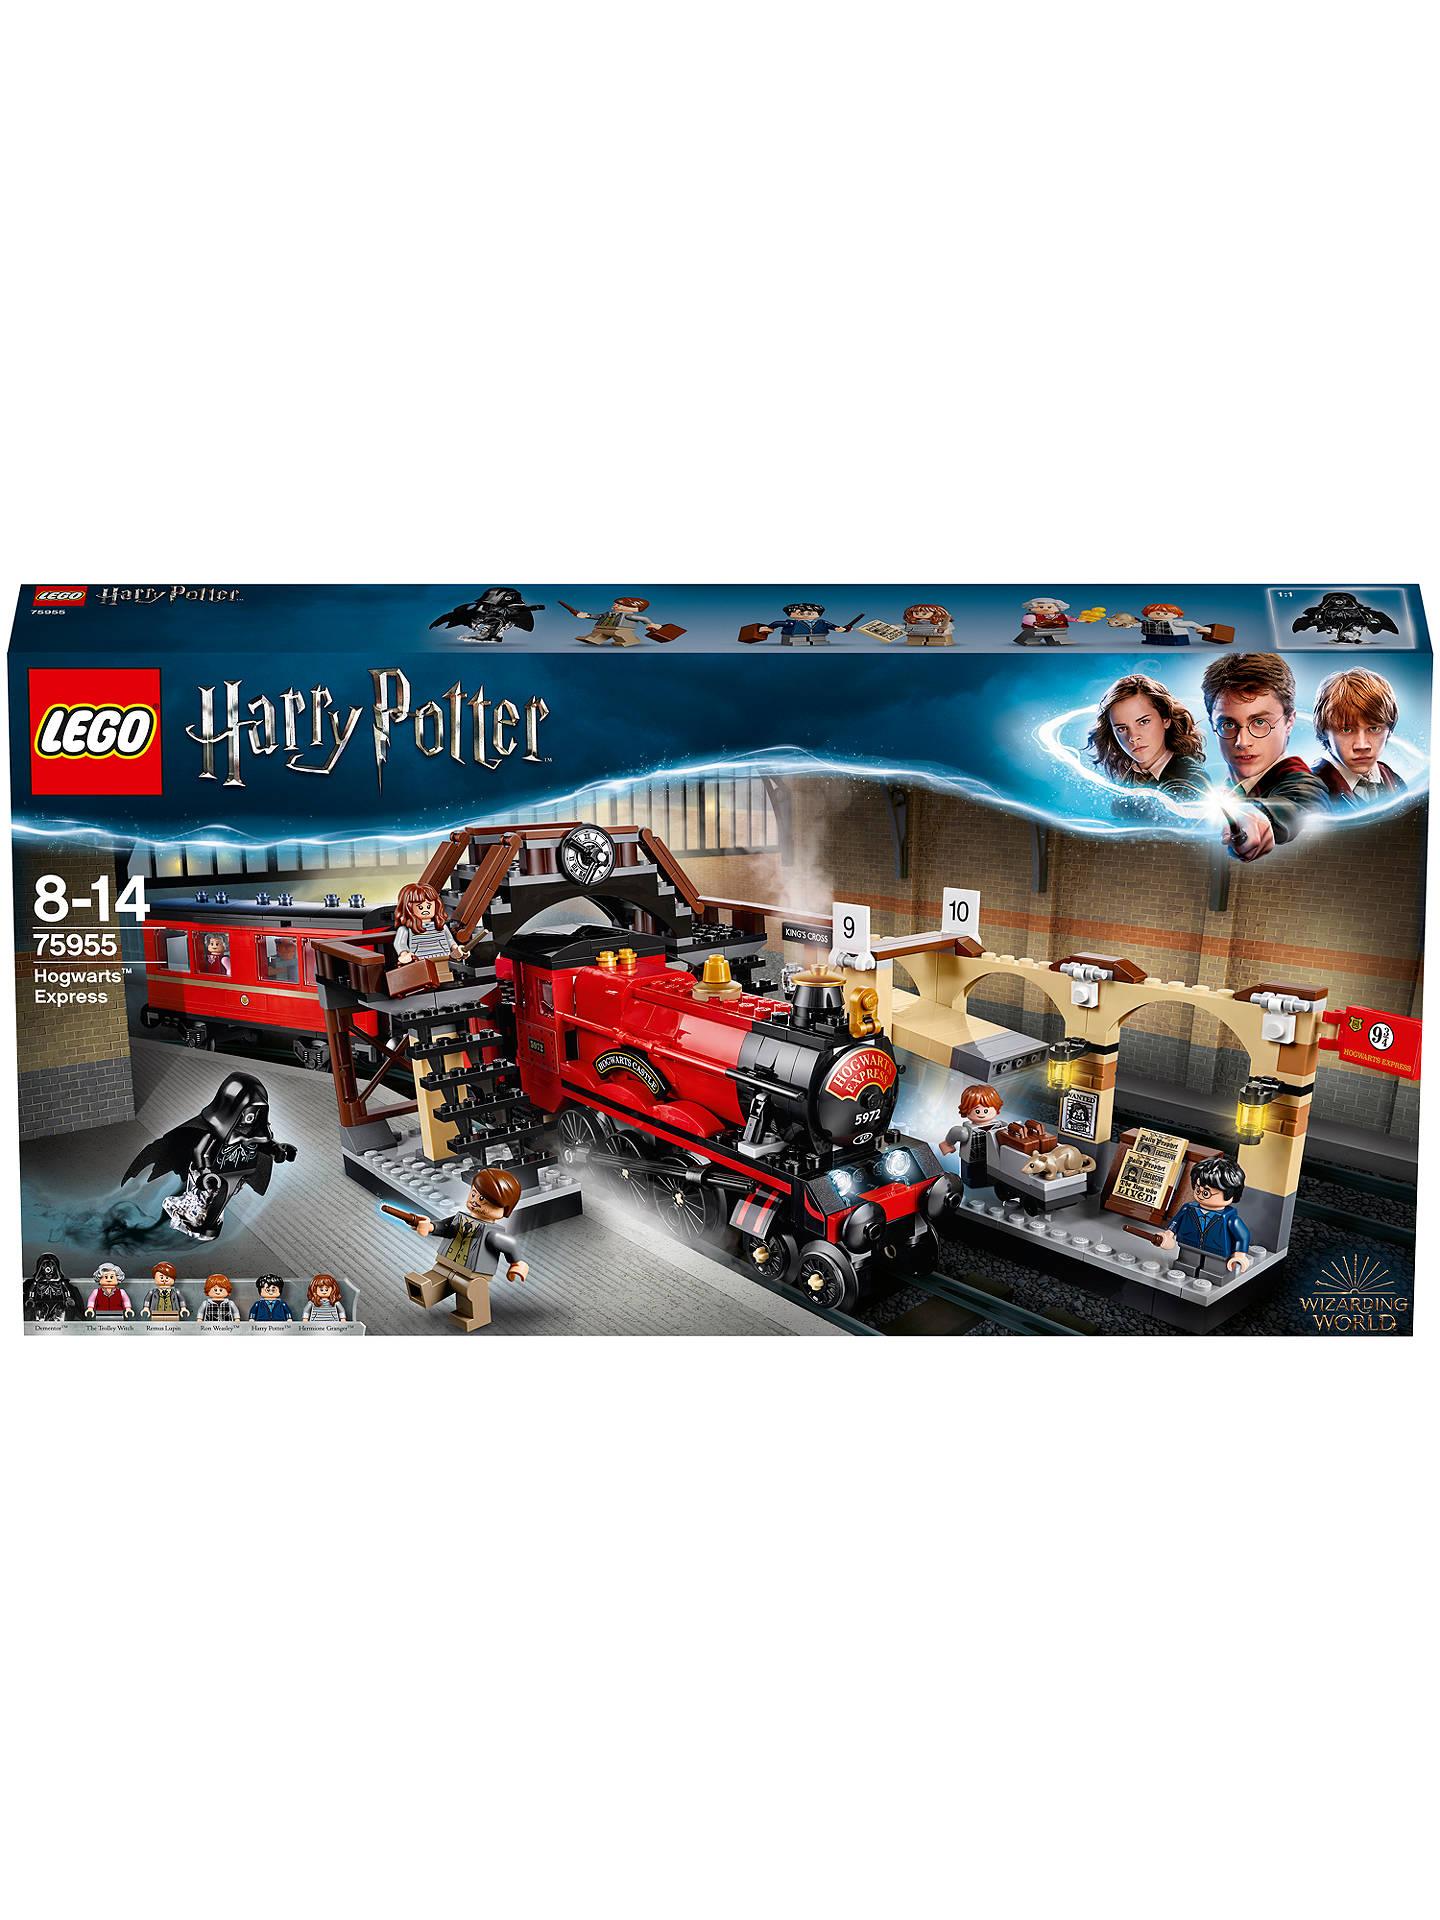 Zabawki konstrukcyjne Lego harry potter Hogwarts Express as photo 6 Minifigures 75955 SHOP CLOSING